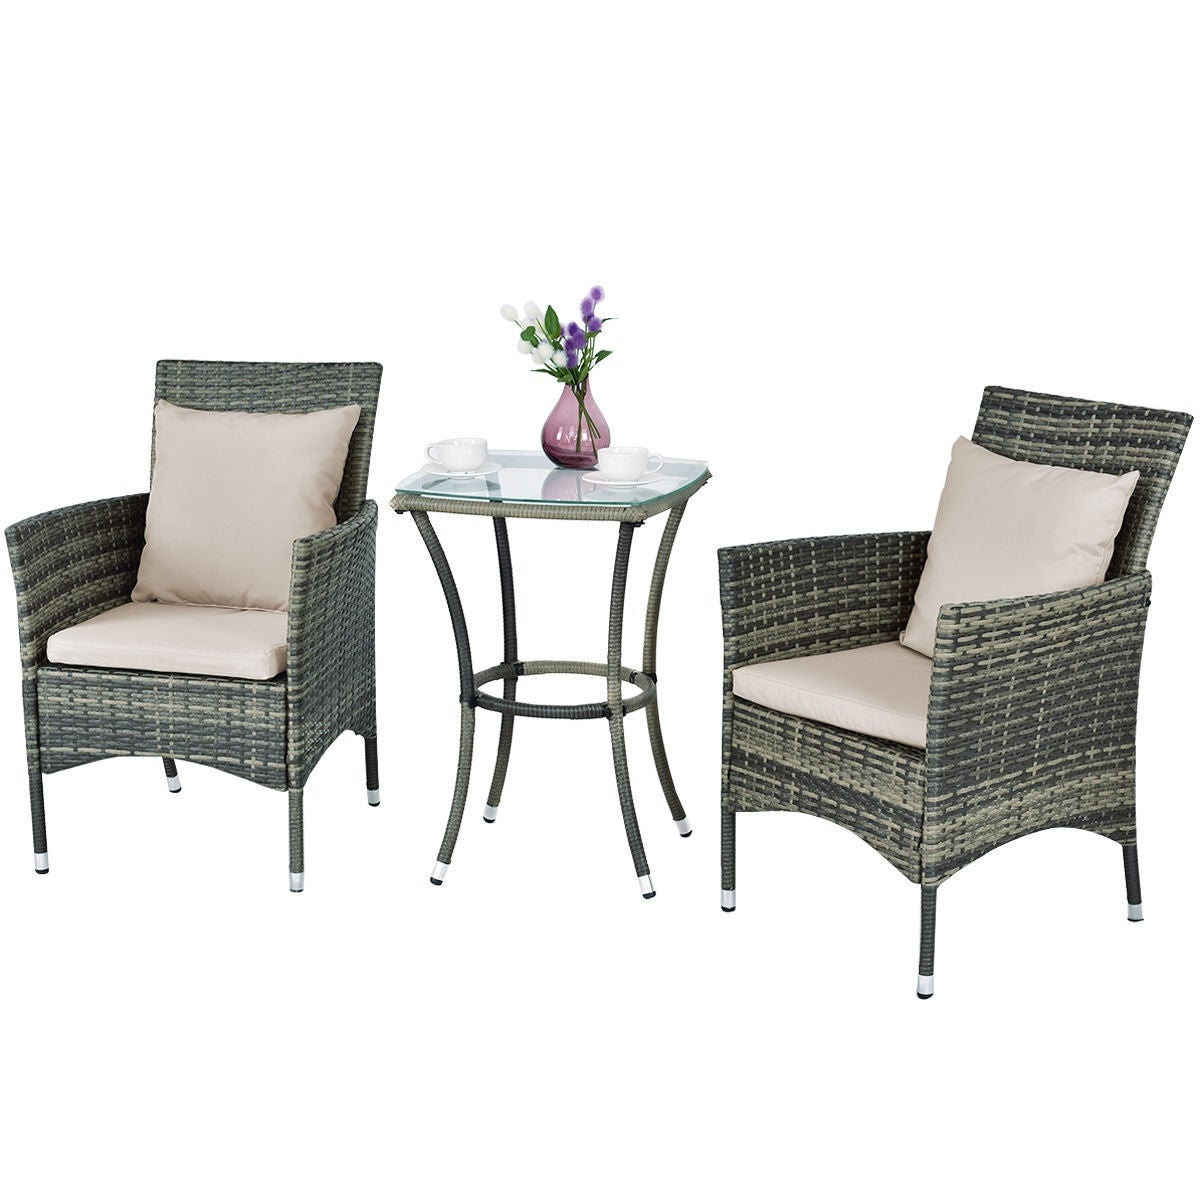 Shop Costway 3PCS Patio Rattan Furniture Set Chairs & Table Garden ...